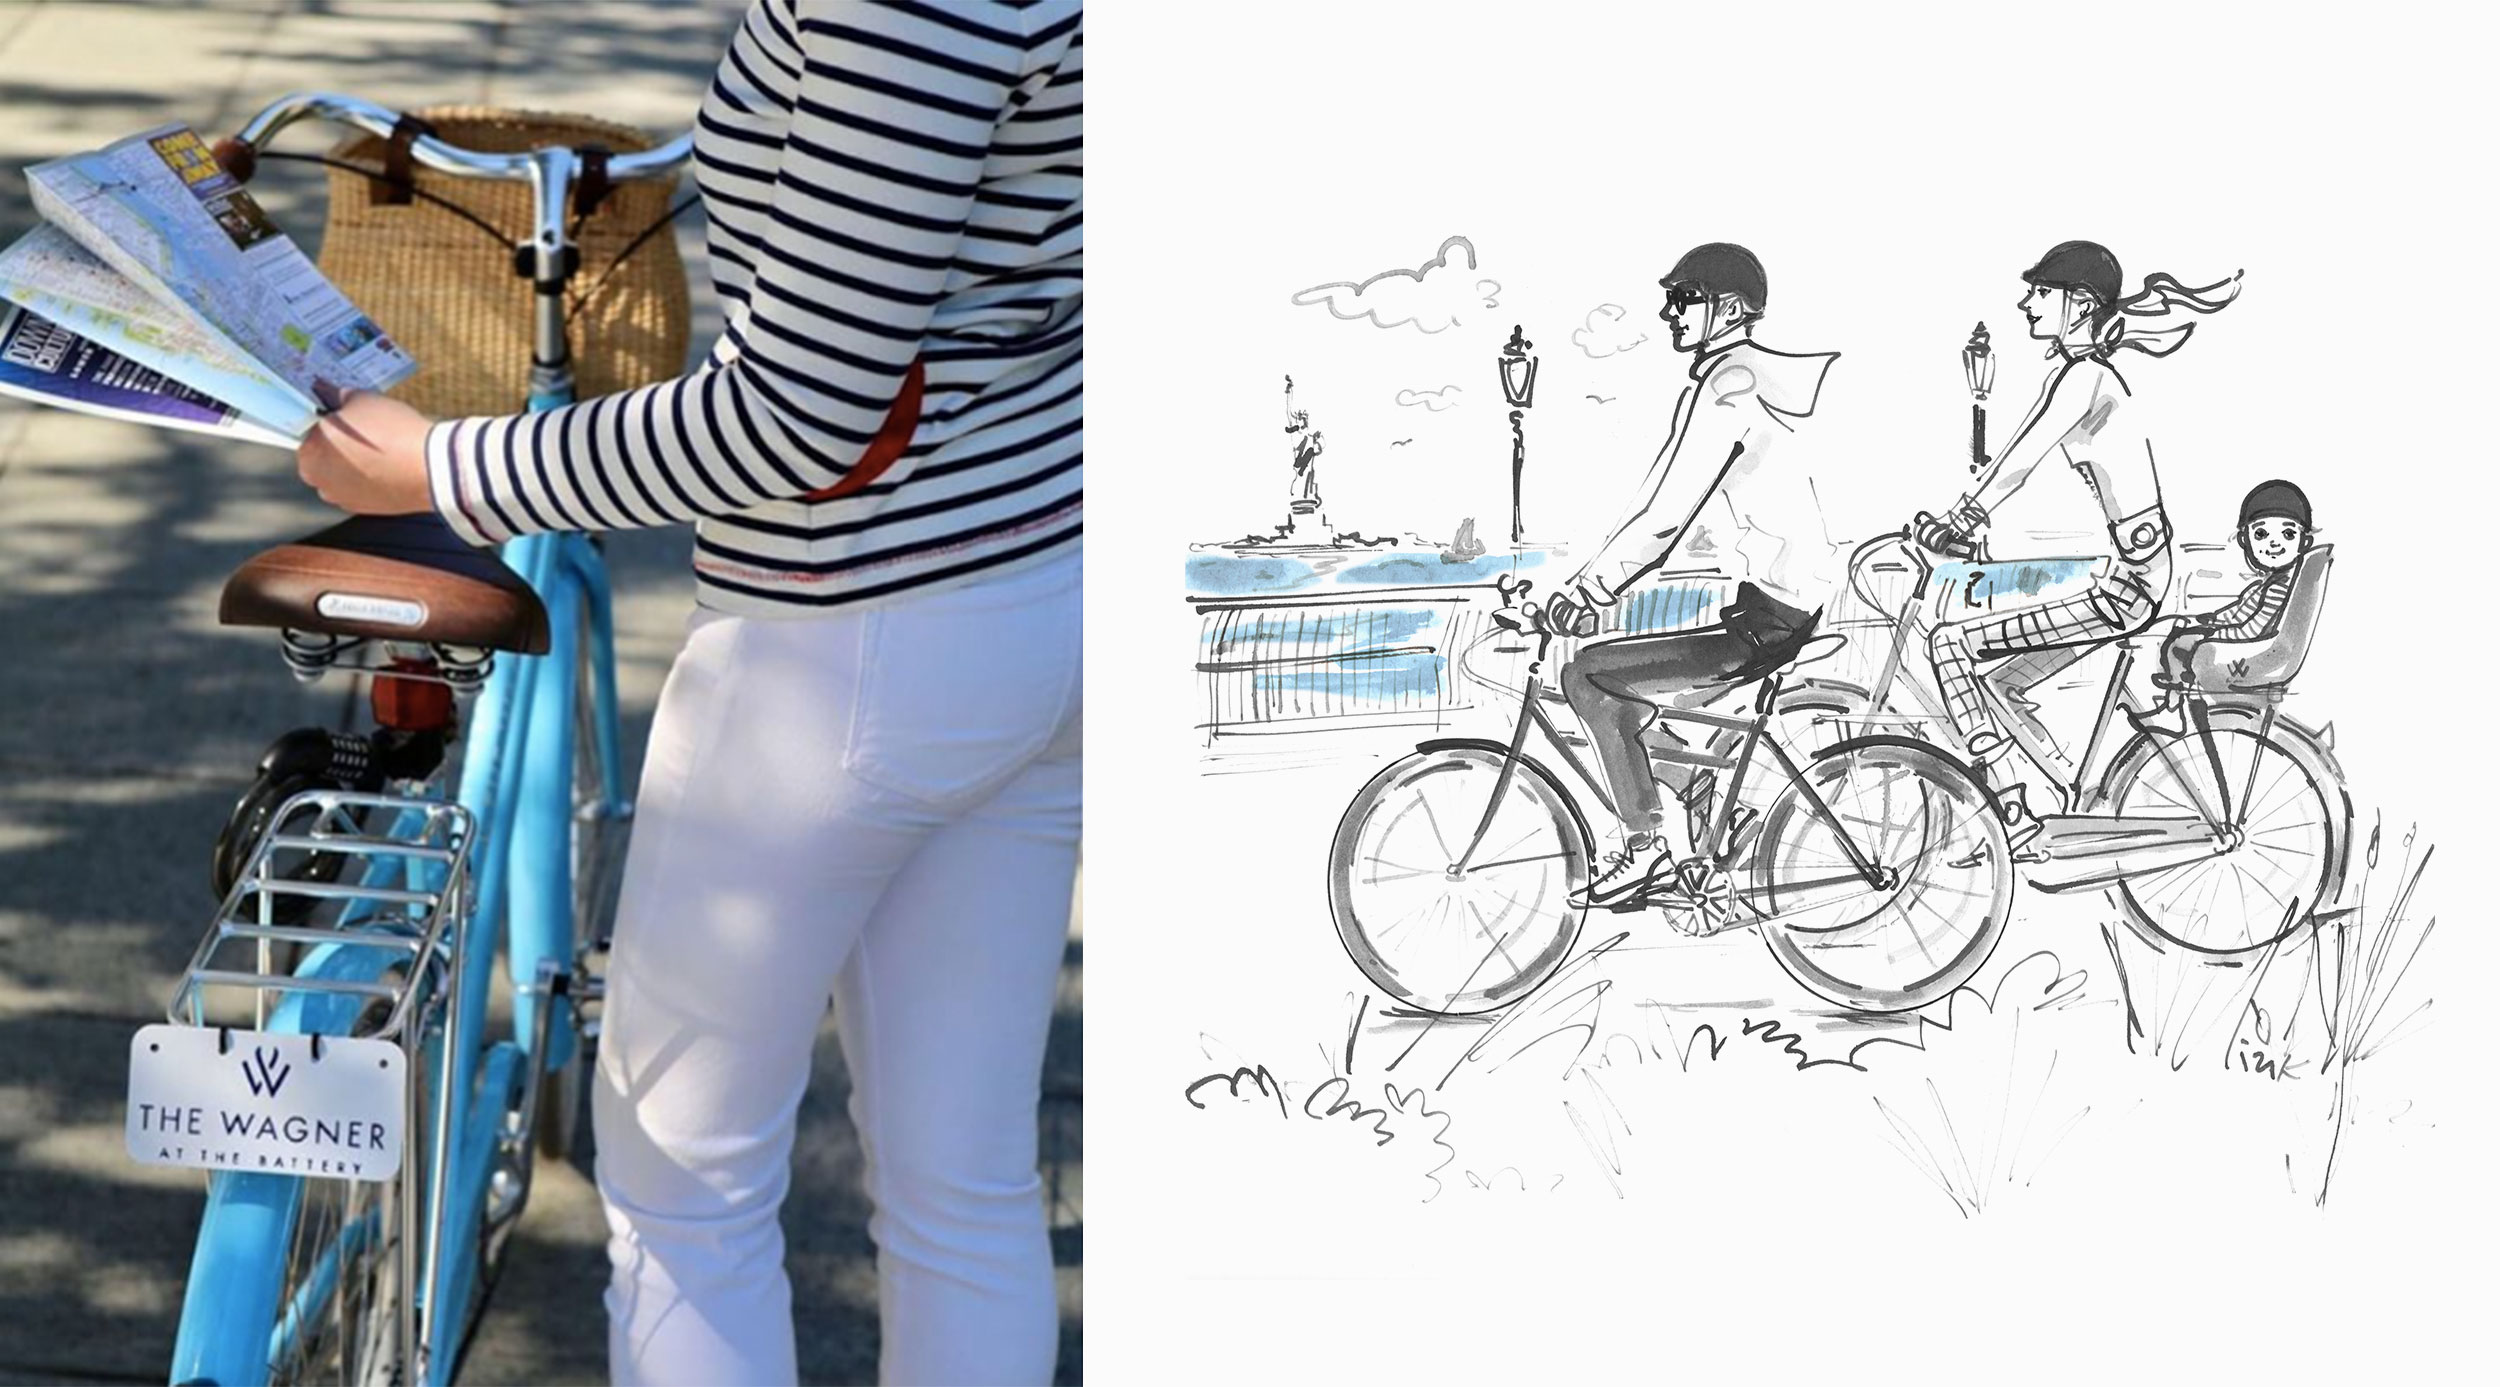 Wagner_creative_bicycle.jpg